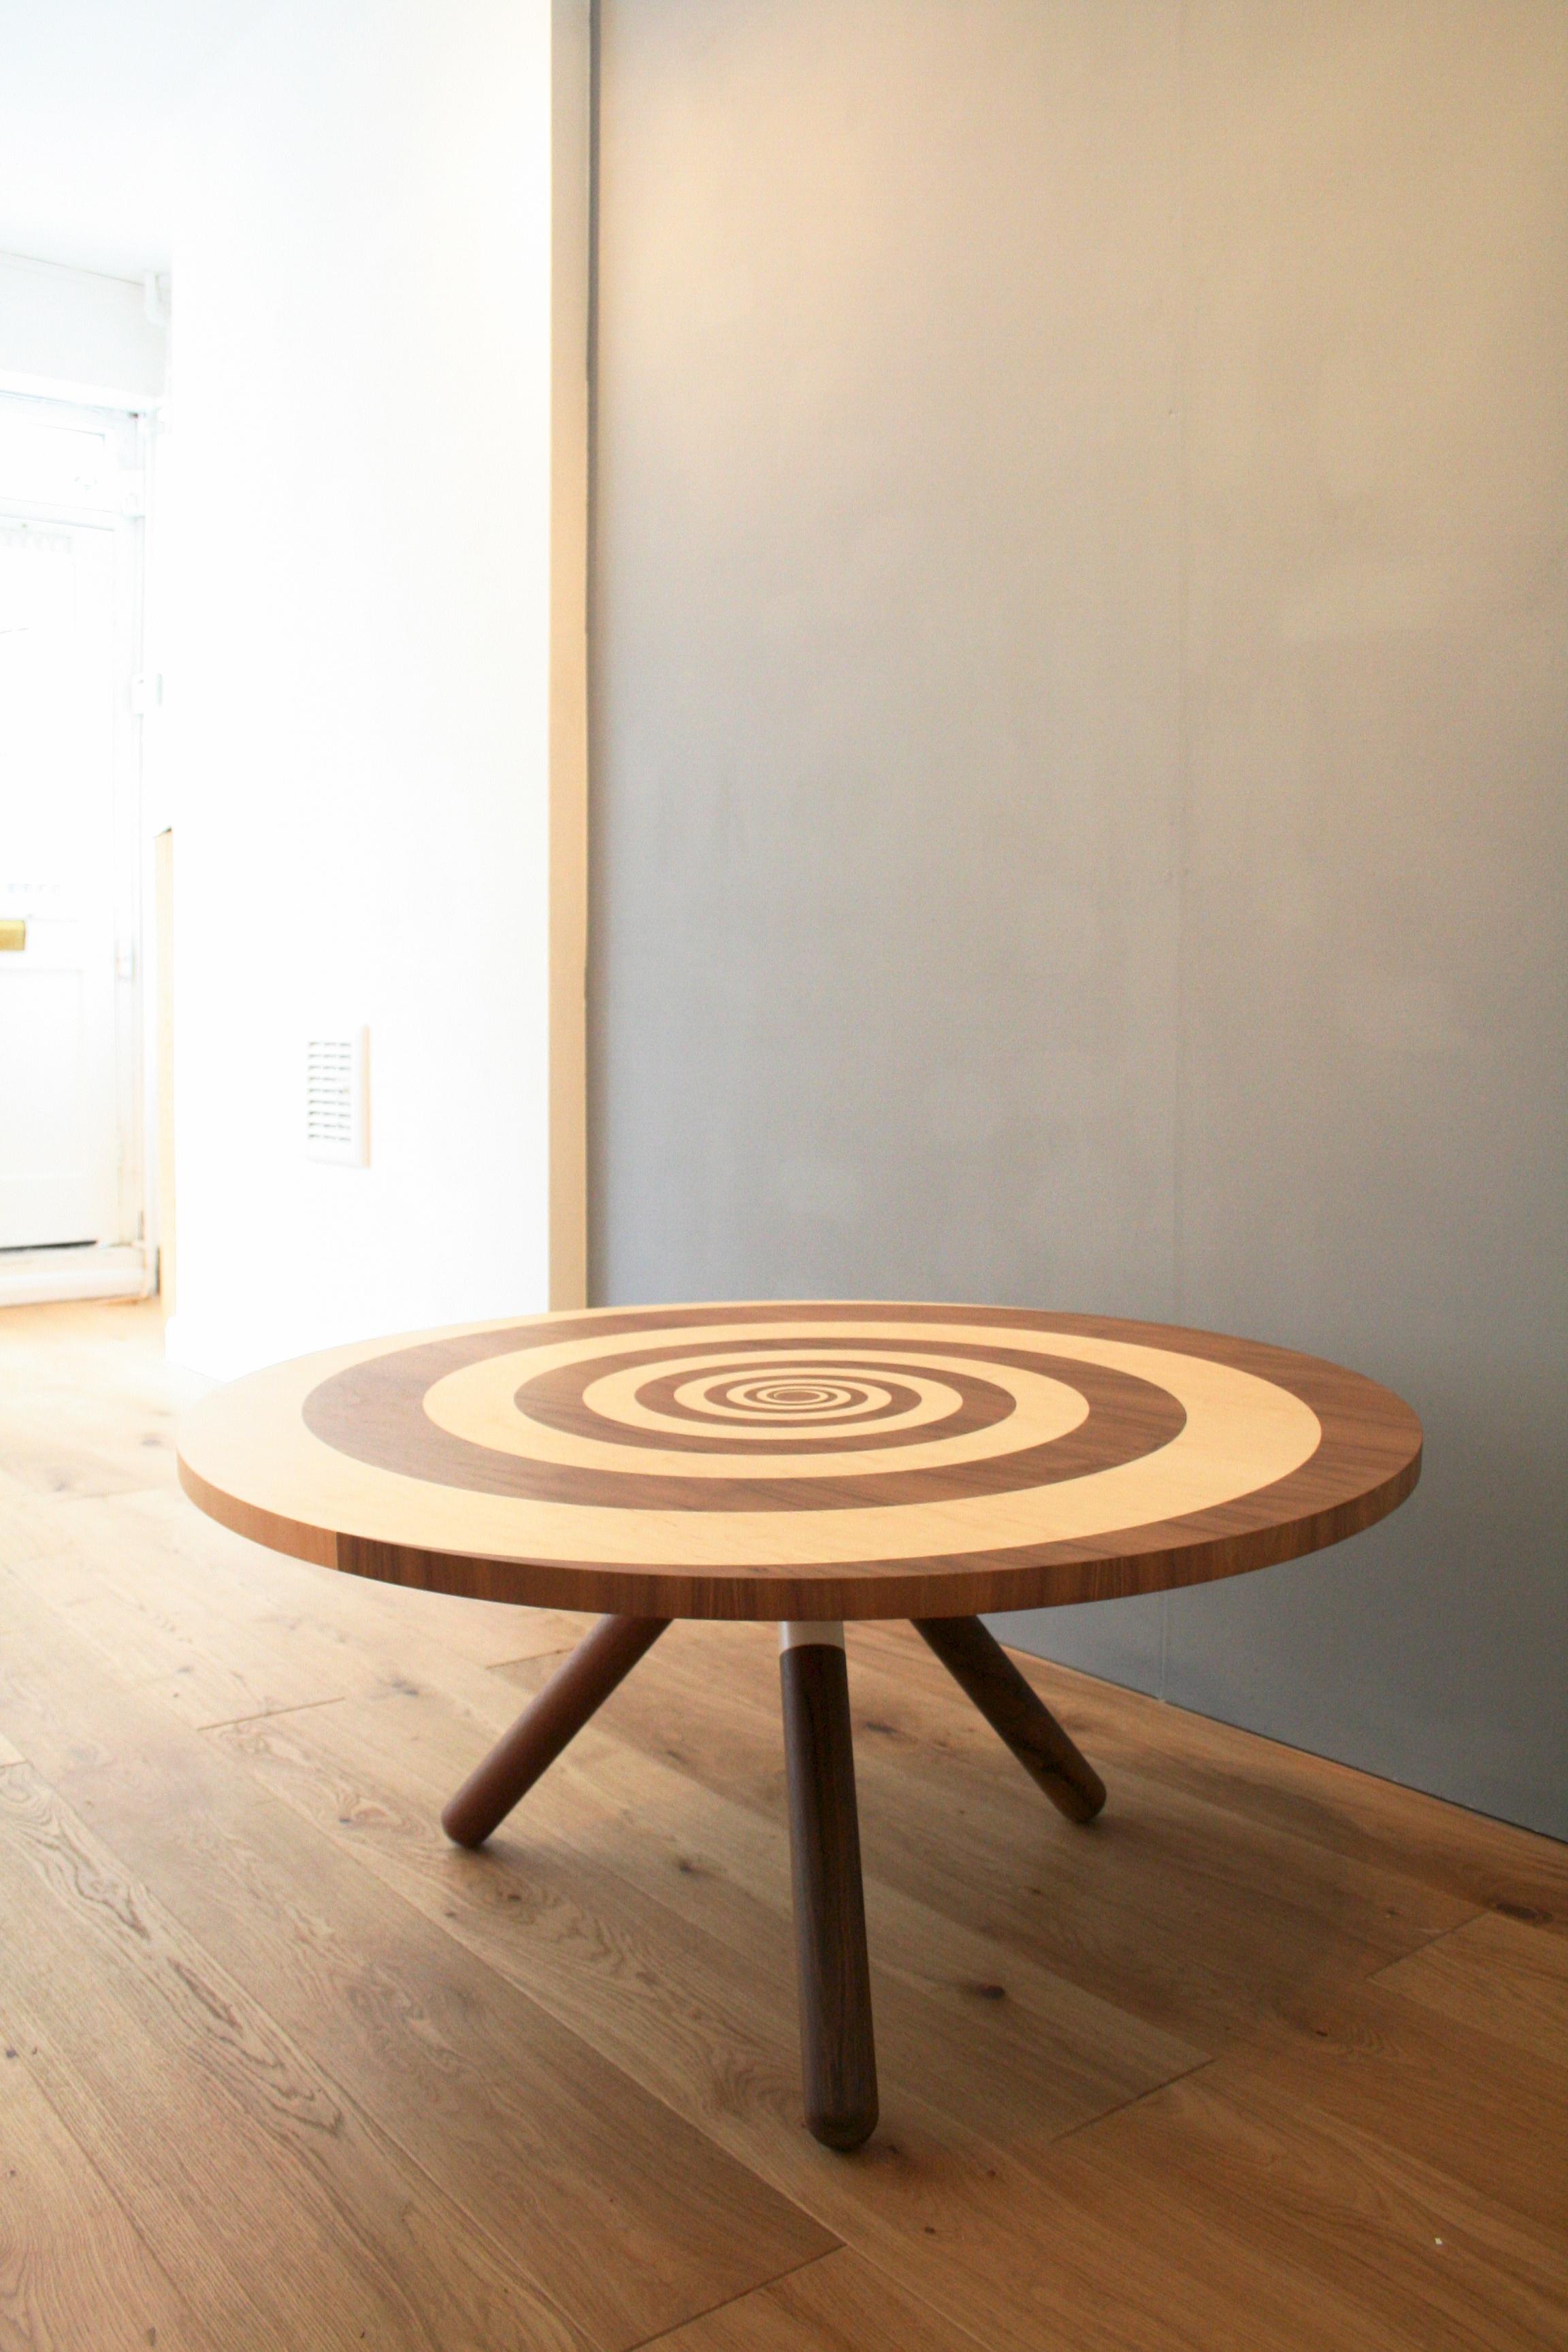 Whirlpool Table